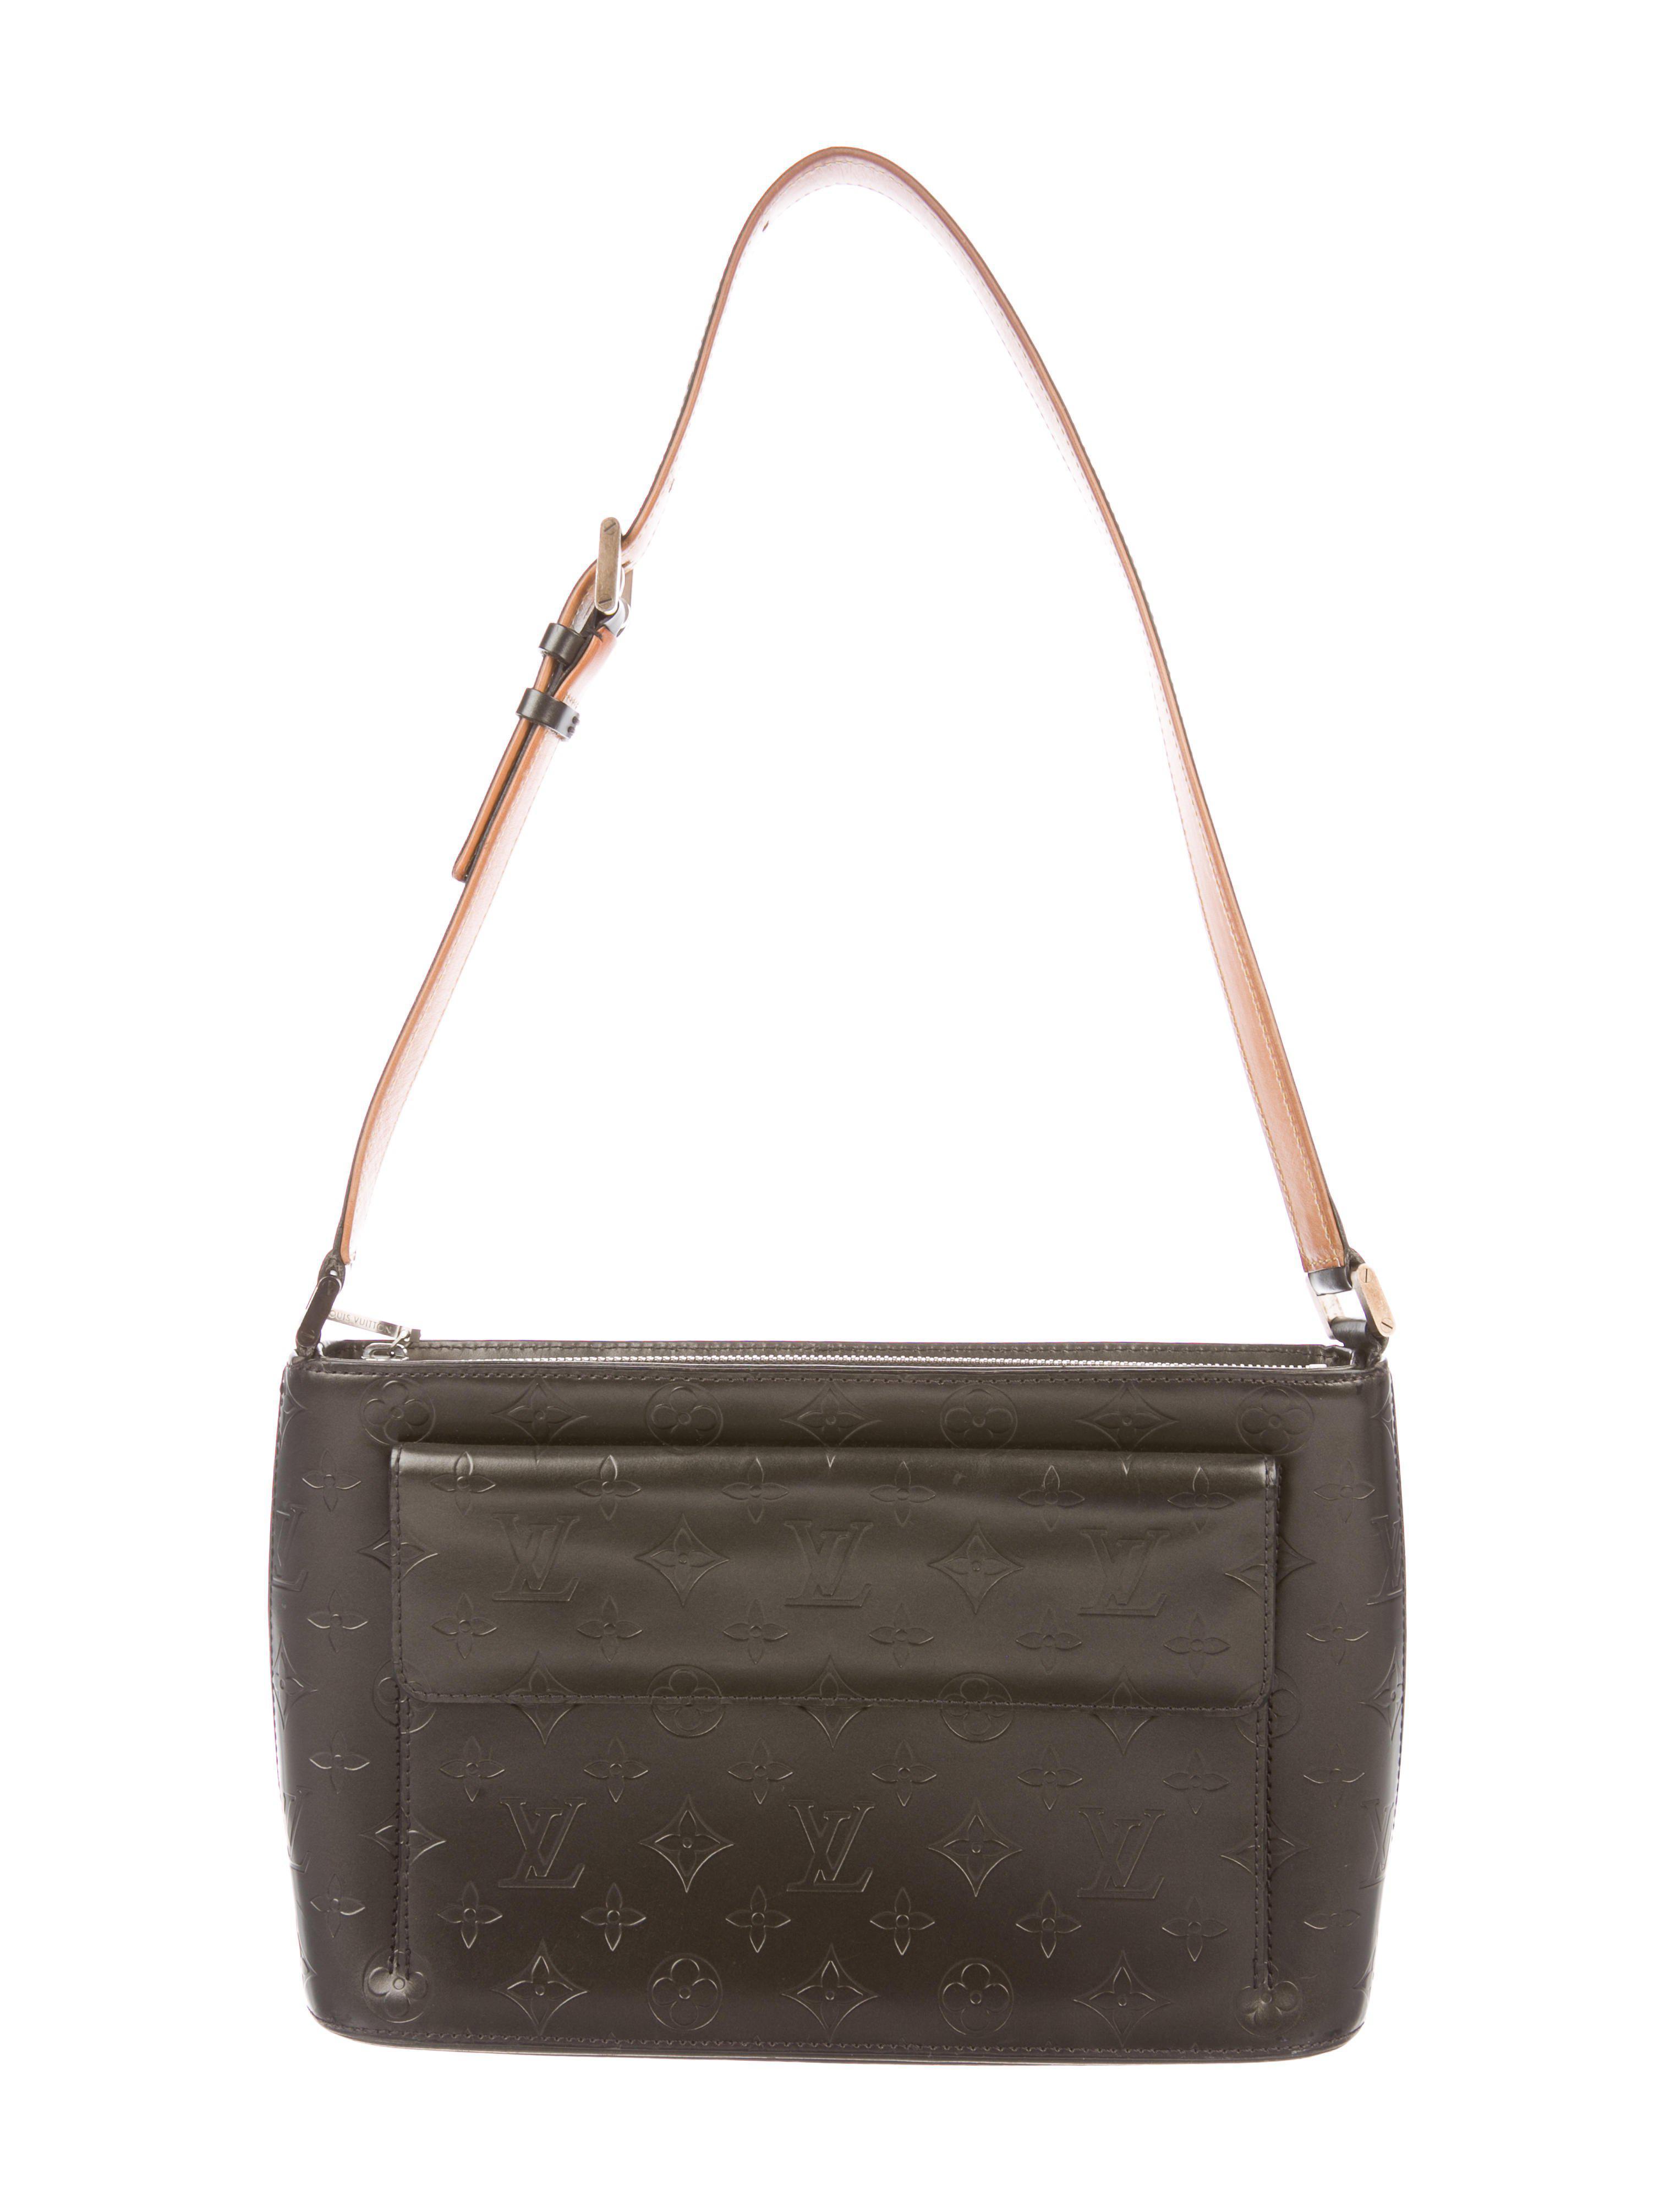 Lyst - Louis Vuitton Monogram Mat Allston Bag in Metallic 28ebc9f82e16d